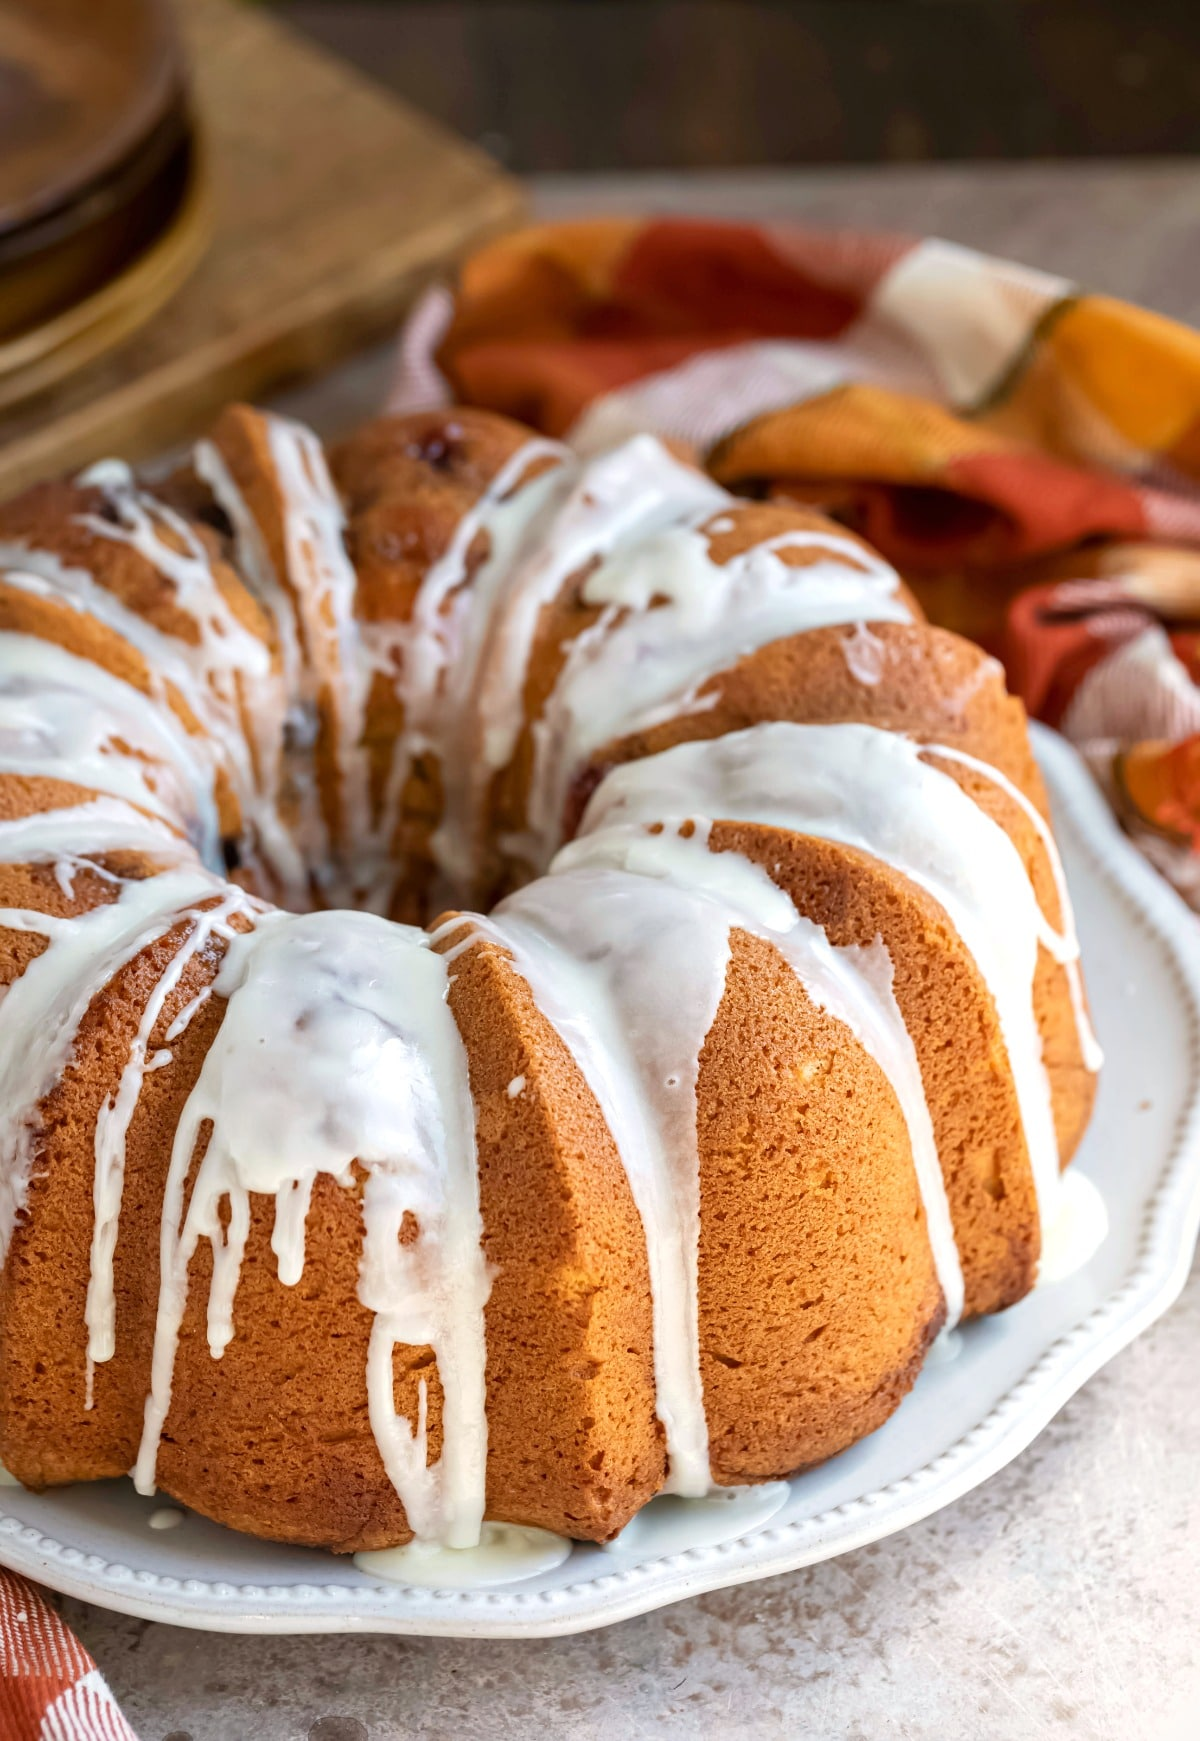 Glazed cranberry orange pound cake on a white platter